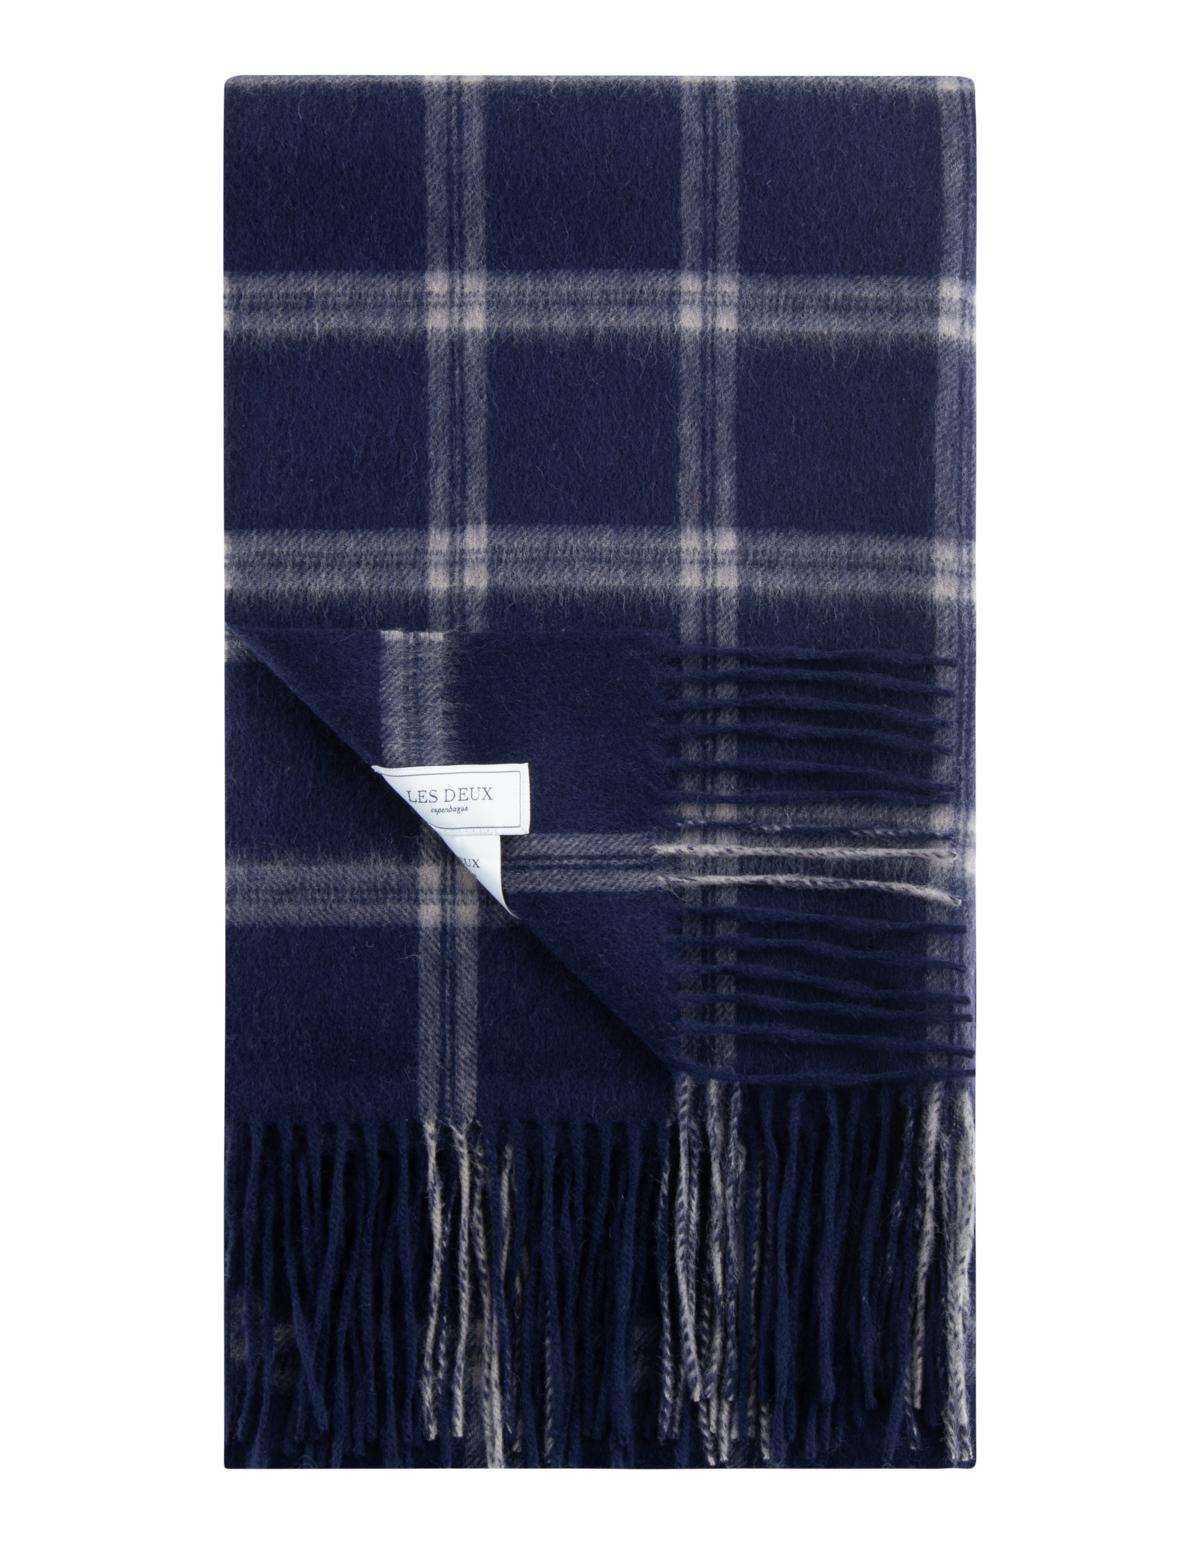 Les Deux LDM910009 halstørklæde